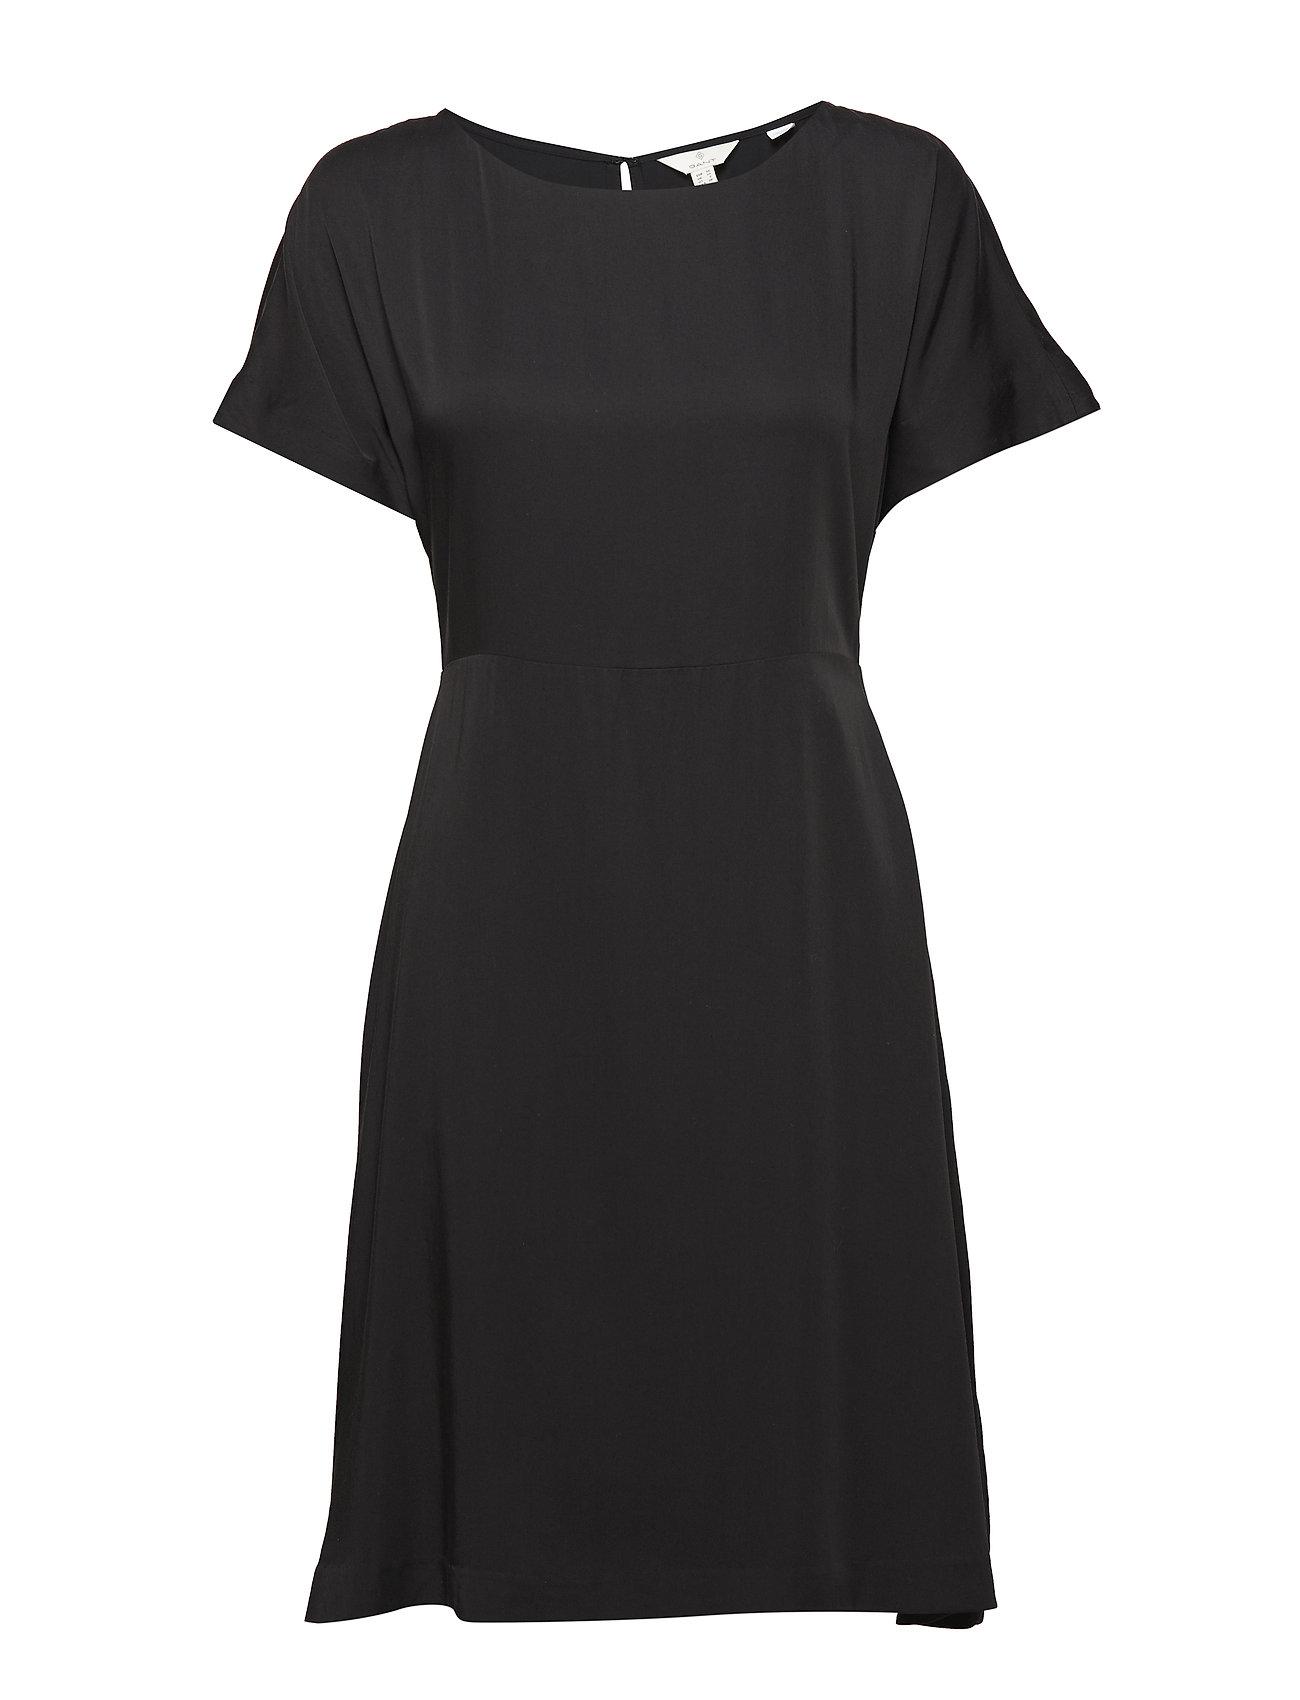 GANT G3. SILKY DRESS - BLACK